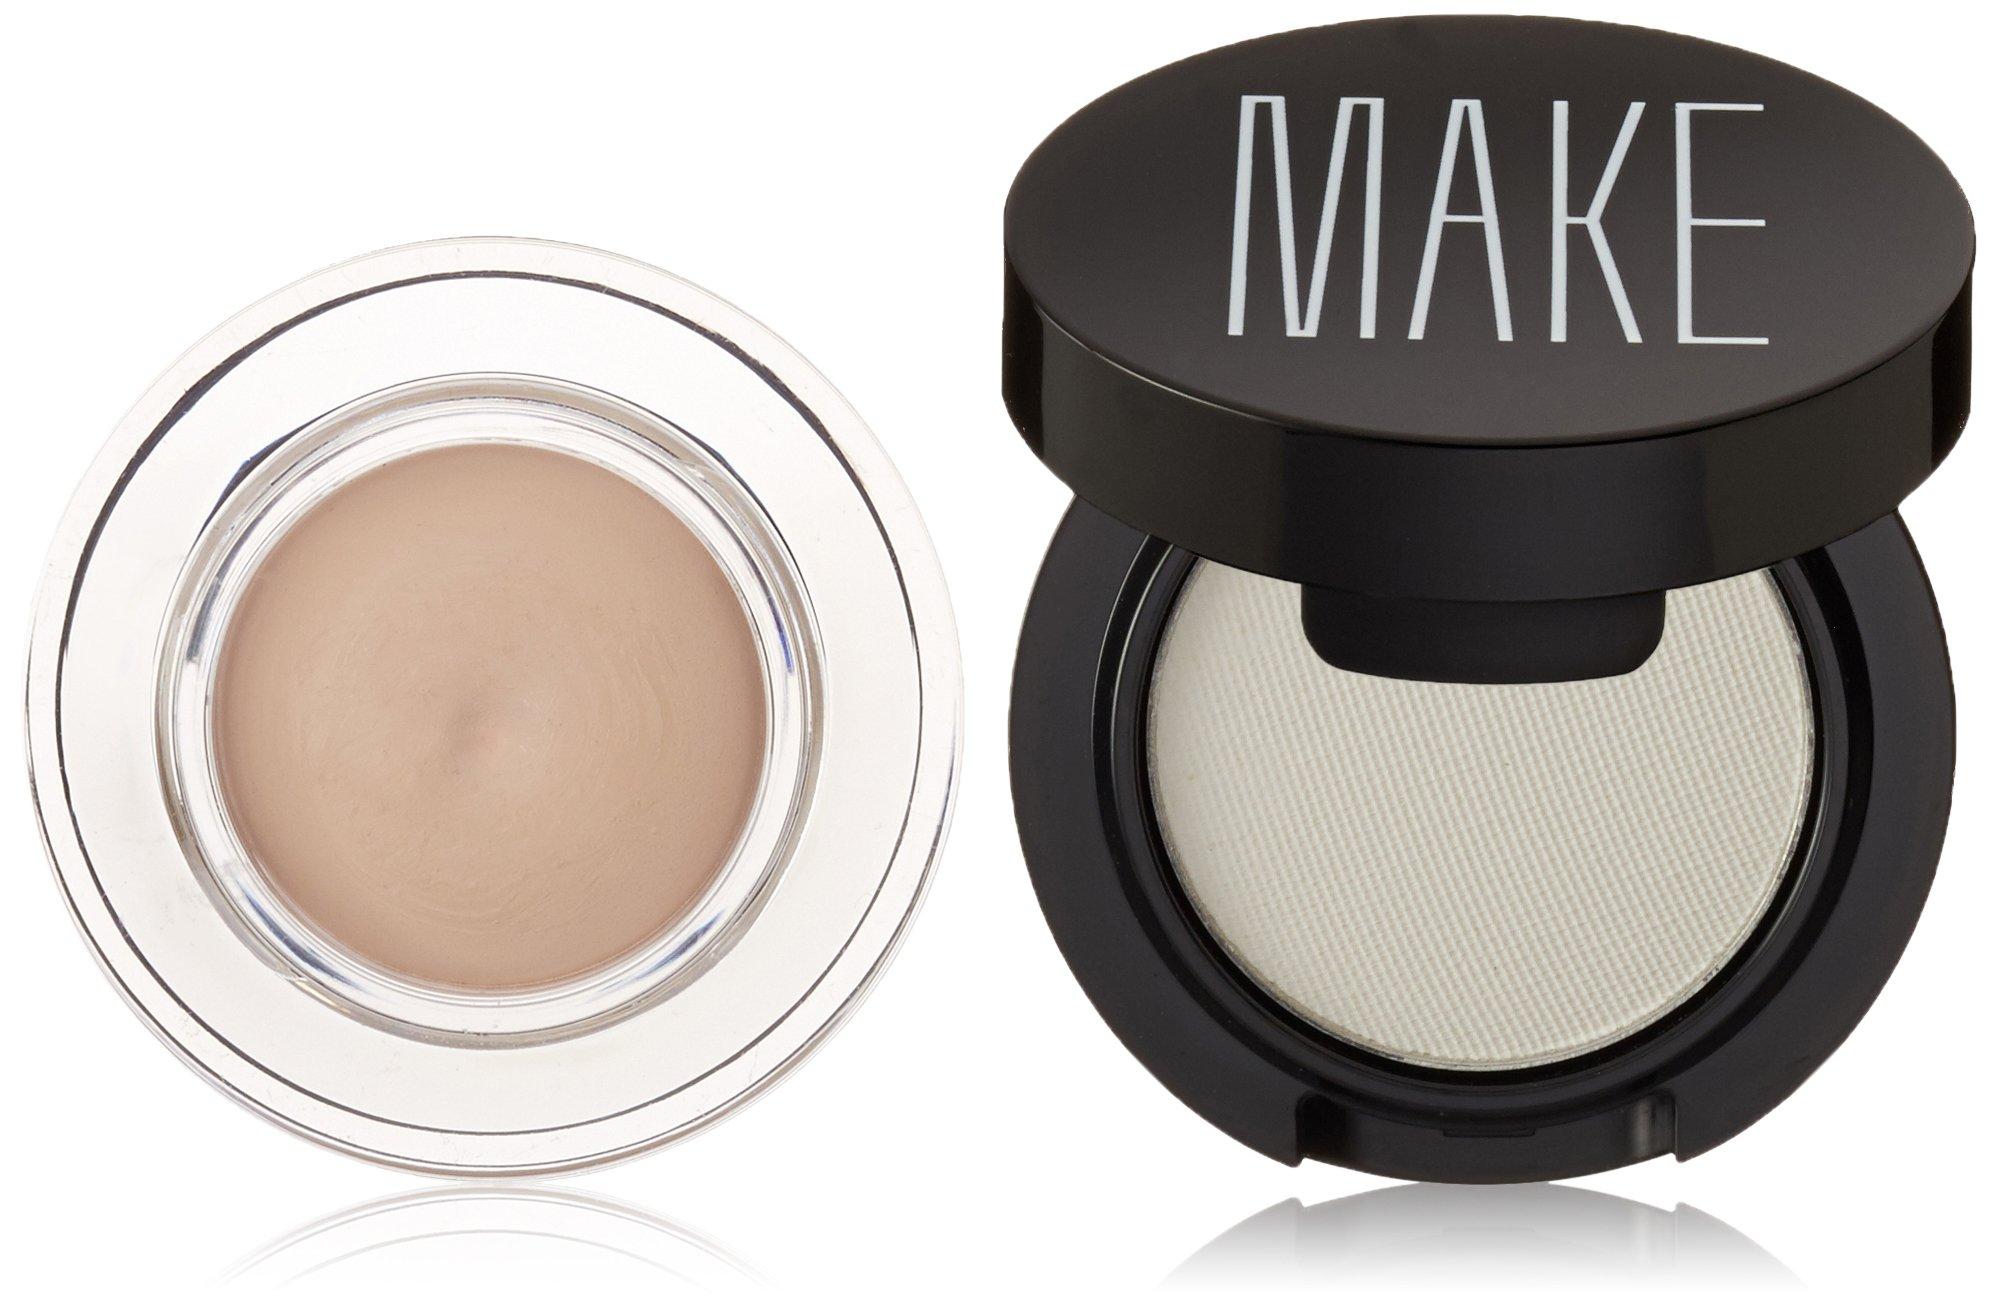 MAKE Cosmetics Soft Focus Corrective Duo Conceal Set, Cool No. 2